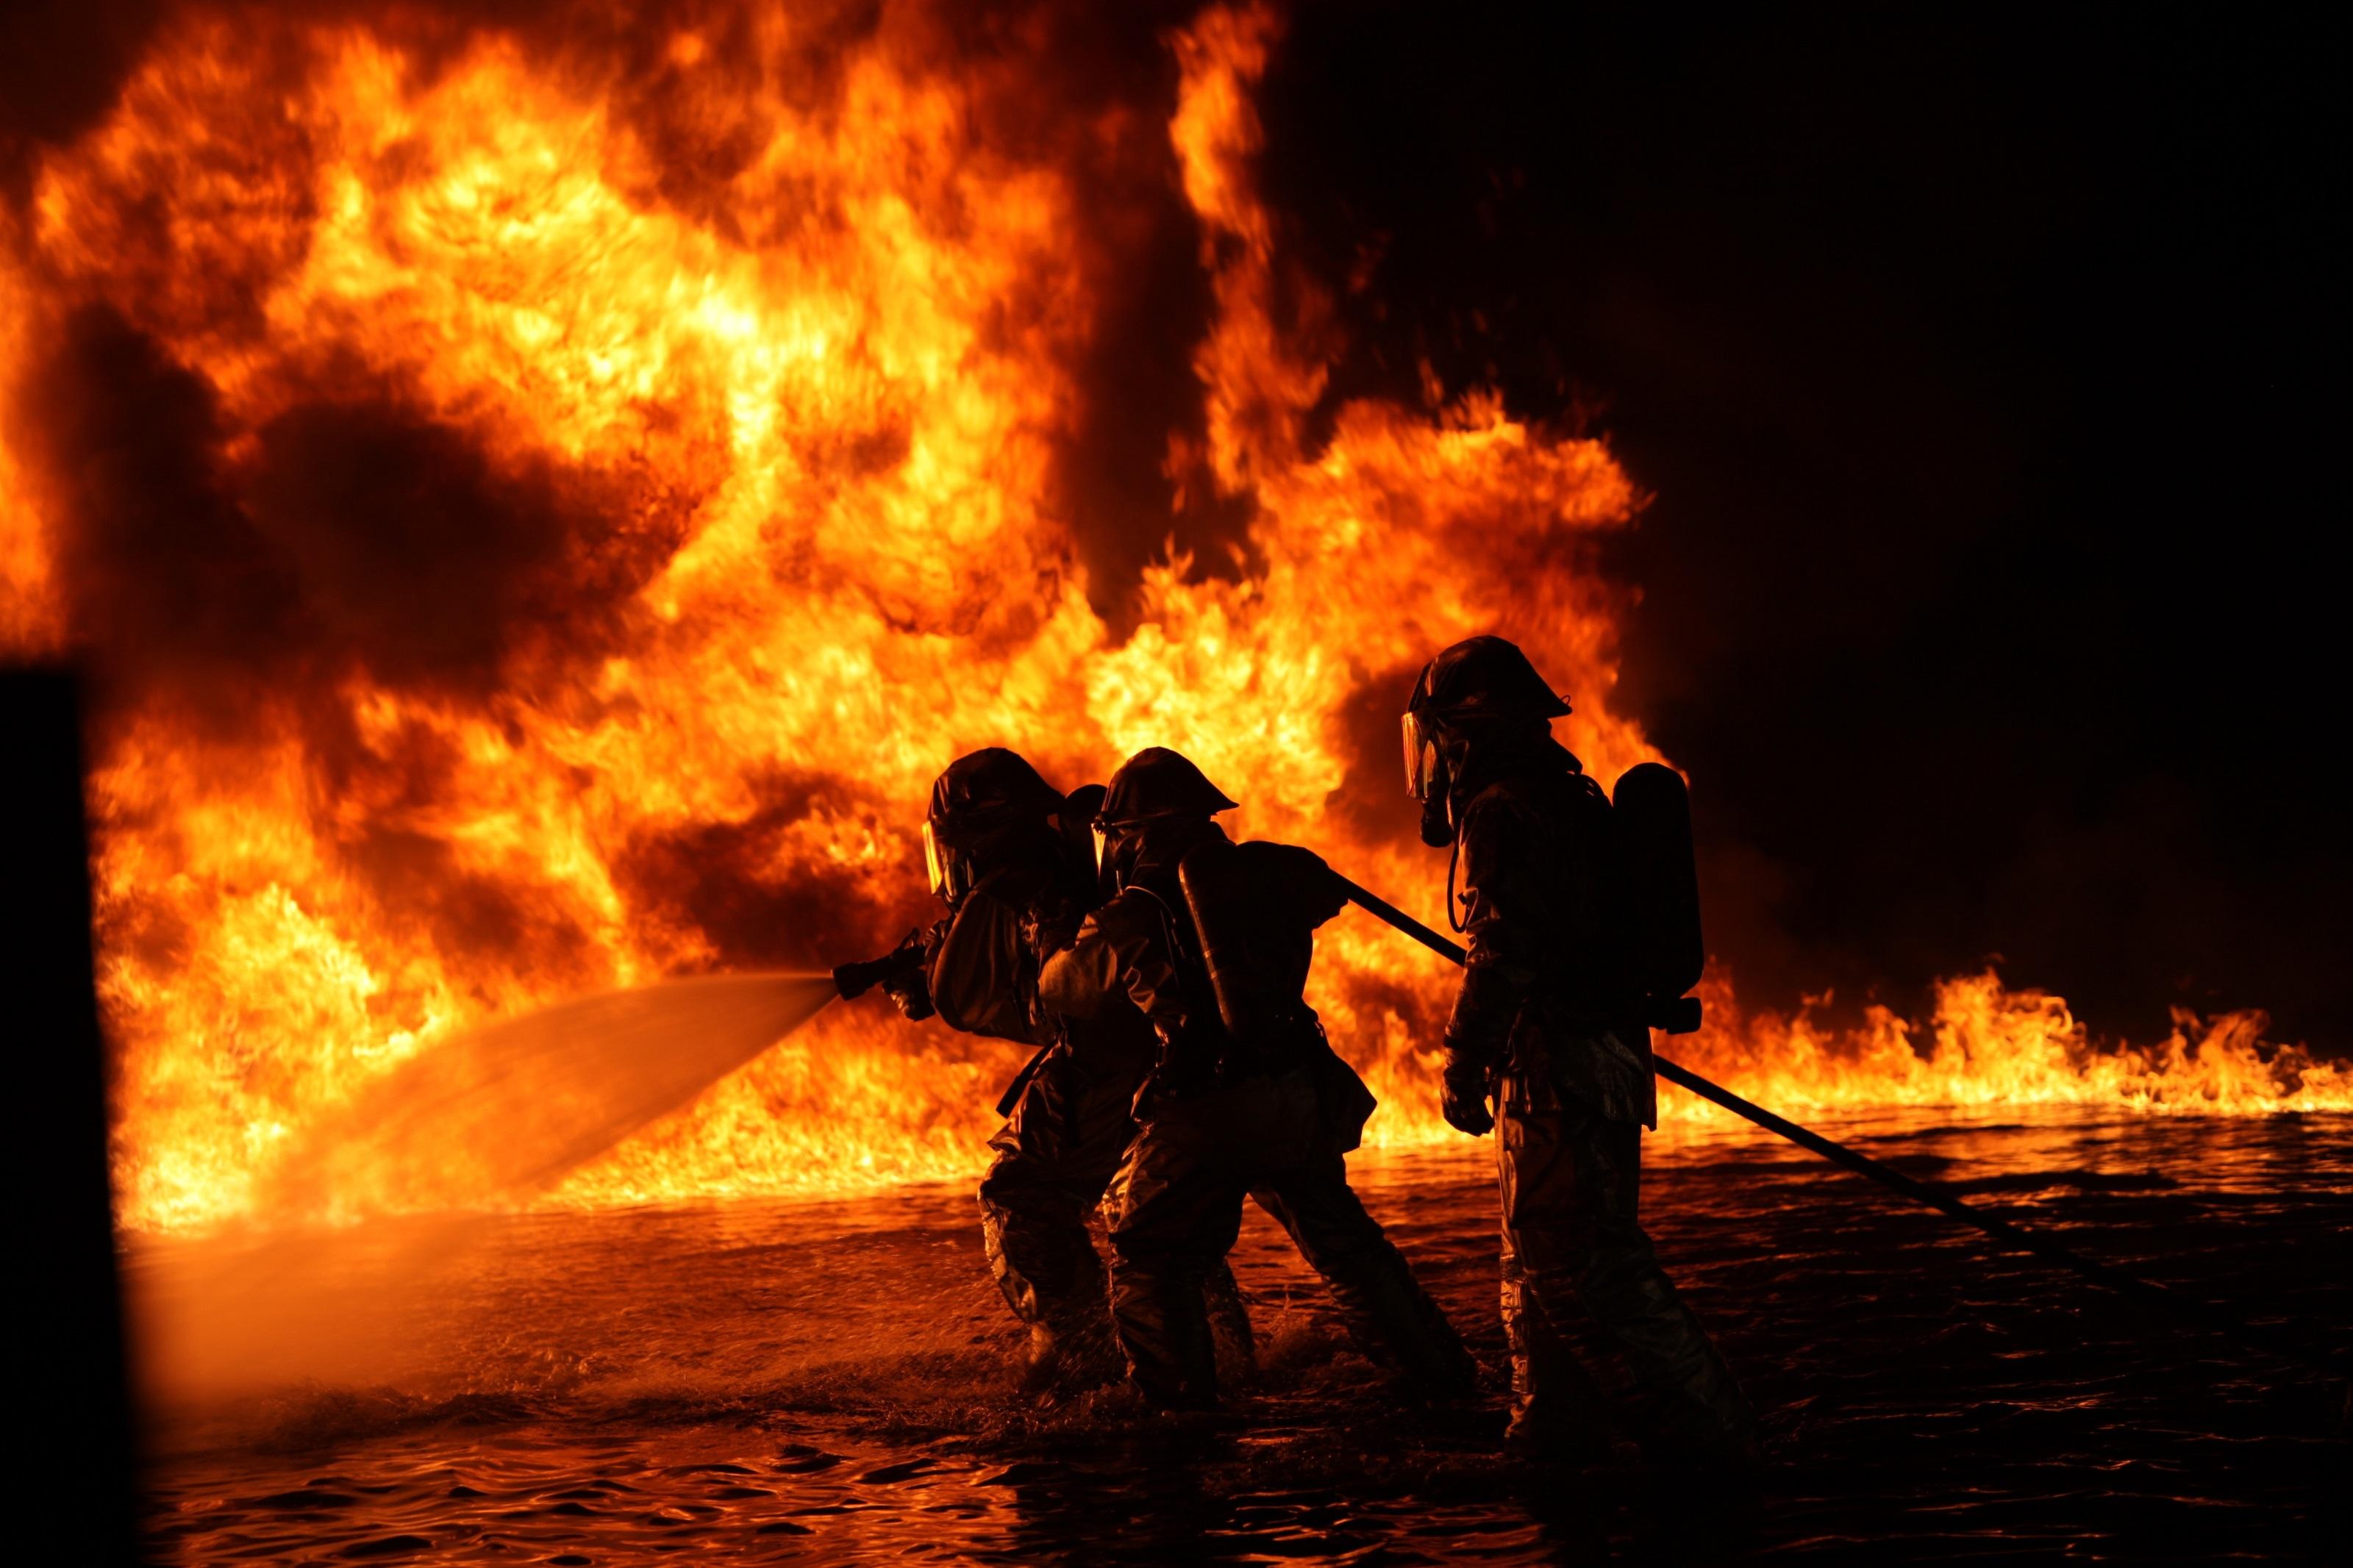 Firemen training photo